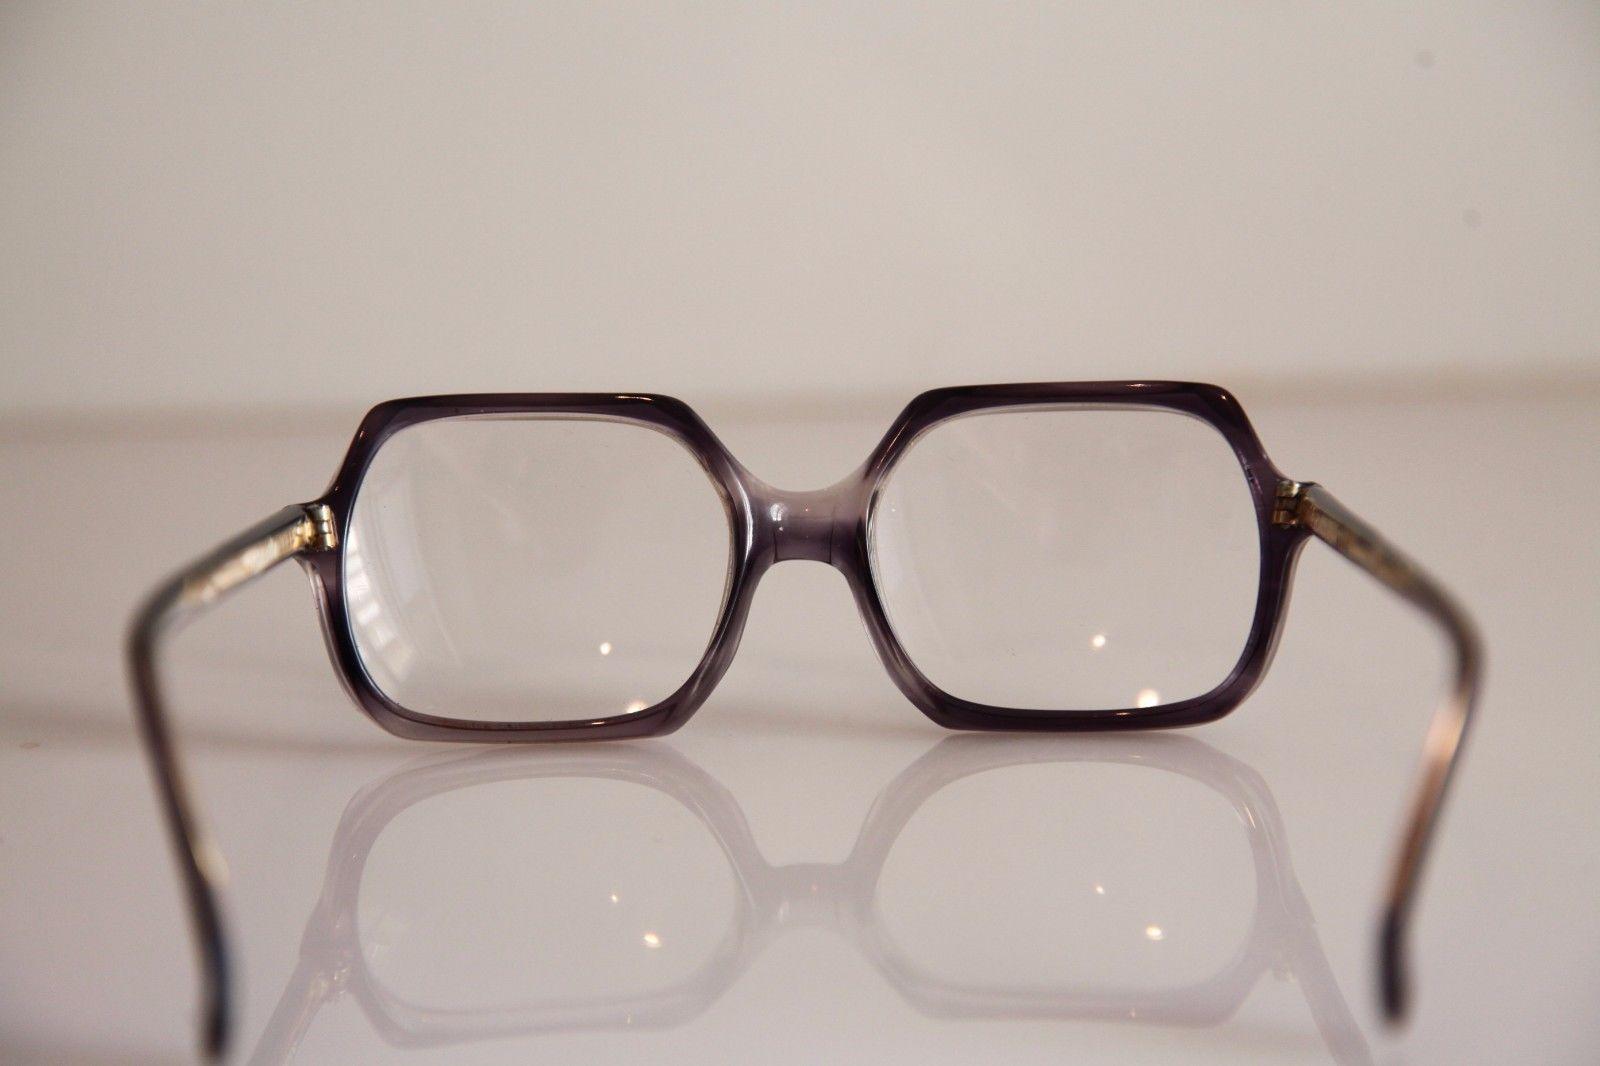 HARGA EVA Eyewear, Crystal Deep Purple Frame, RX-Able Prescription lens. FRANCE image 7